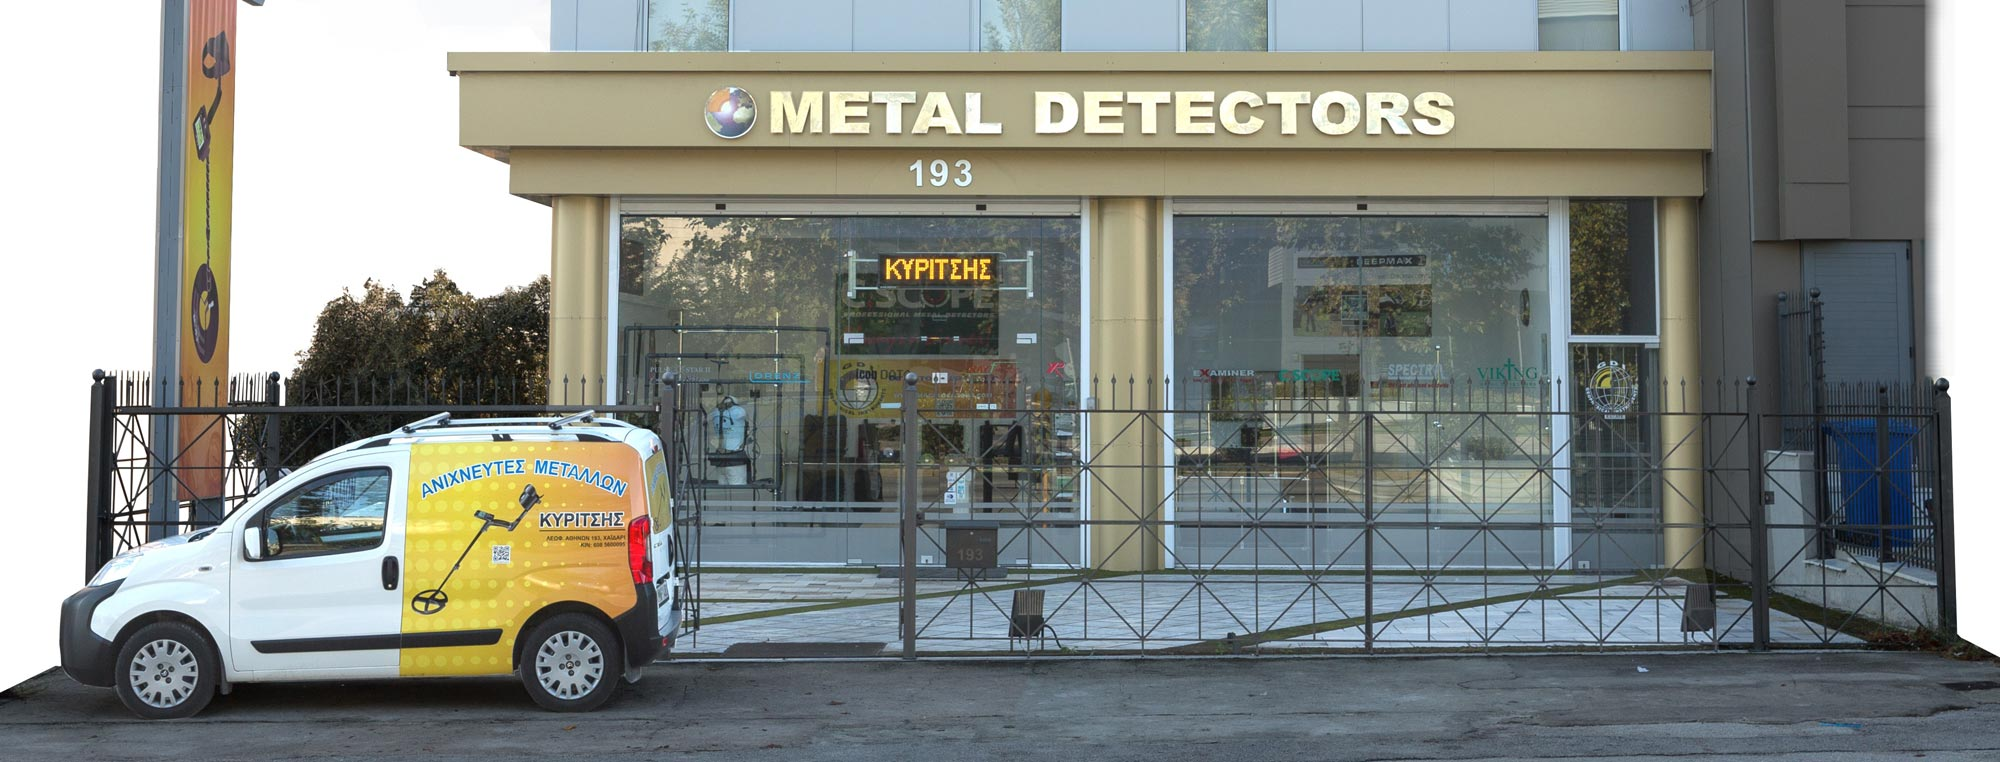 anixneytesrysoy metallon kyritshs athina haidari kabalas